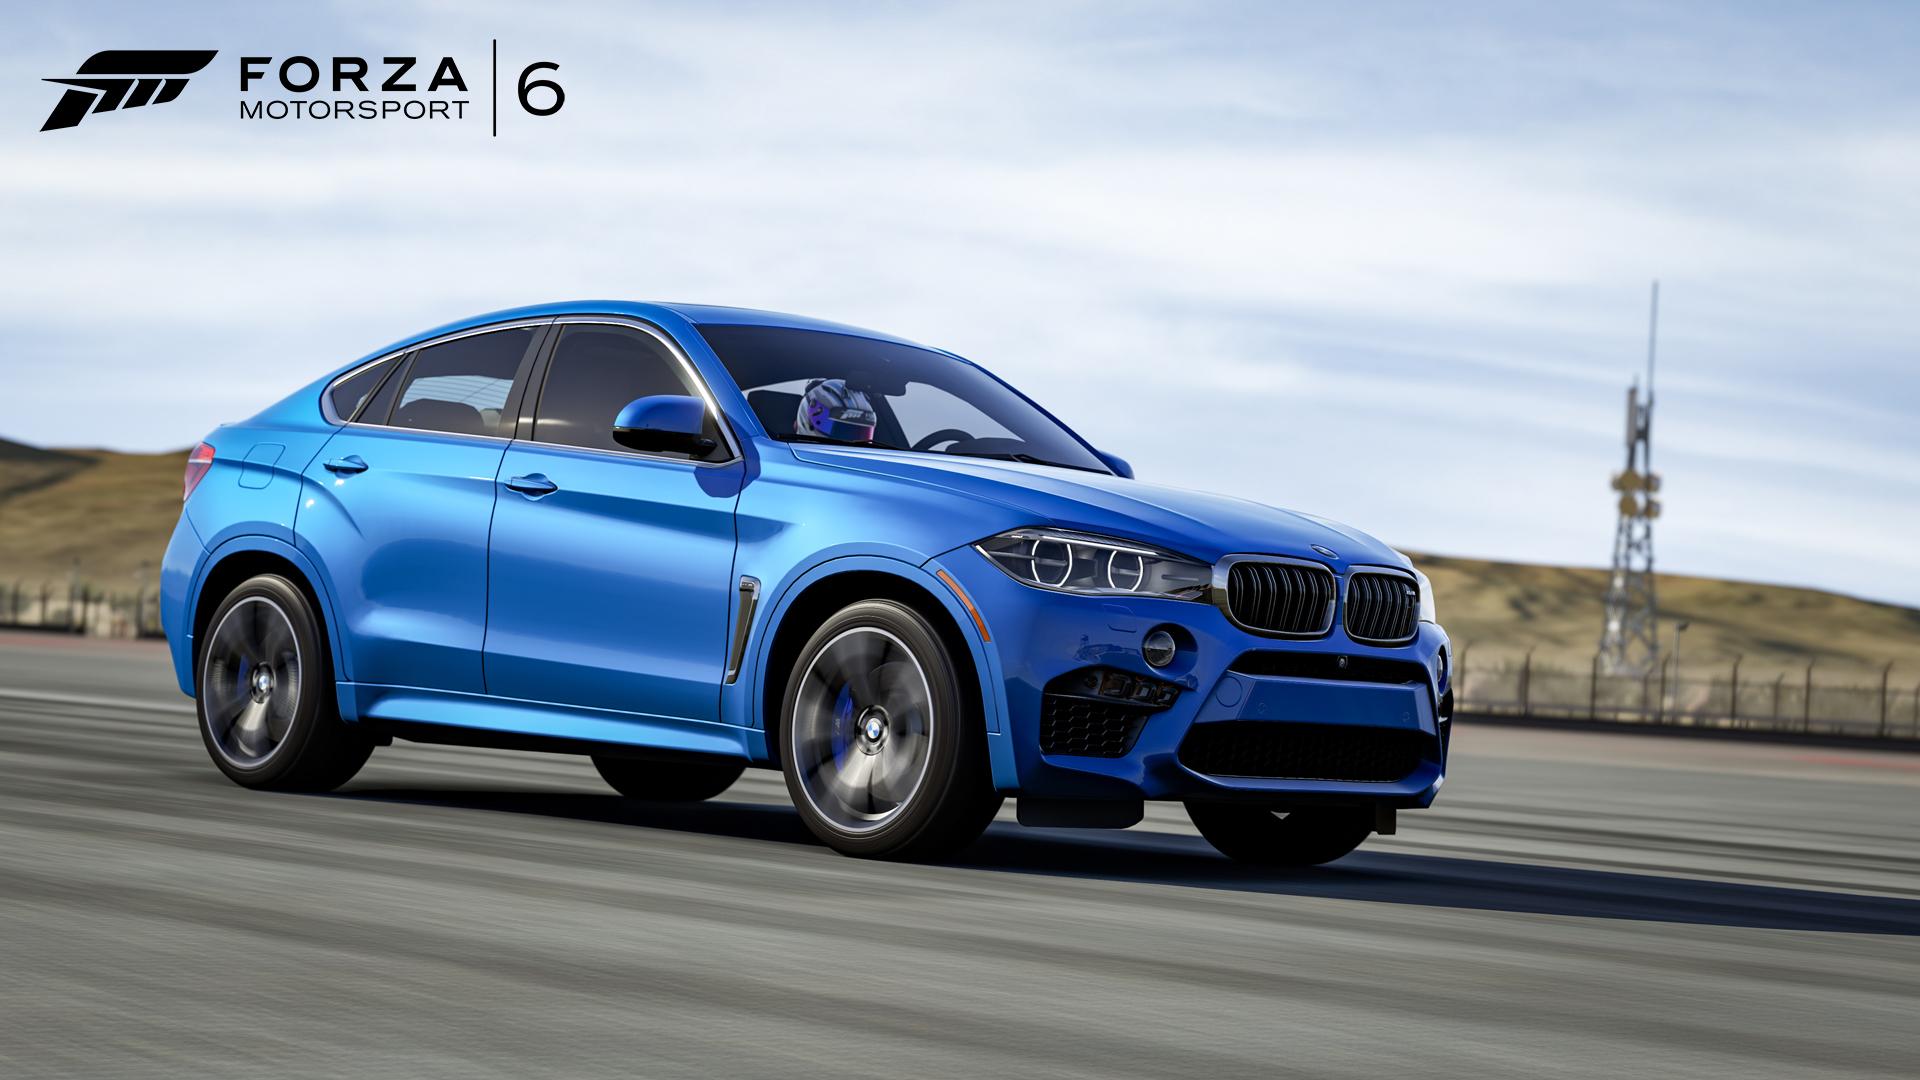 2015 BMW X6M HD Wallpaper | Background Image | 1920x1080 ...